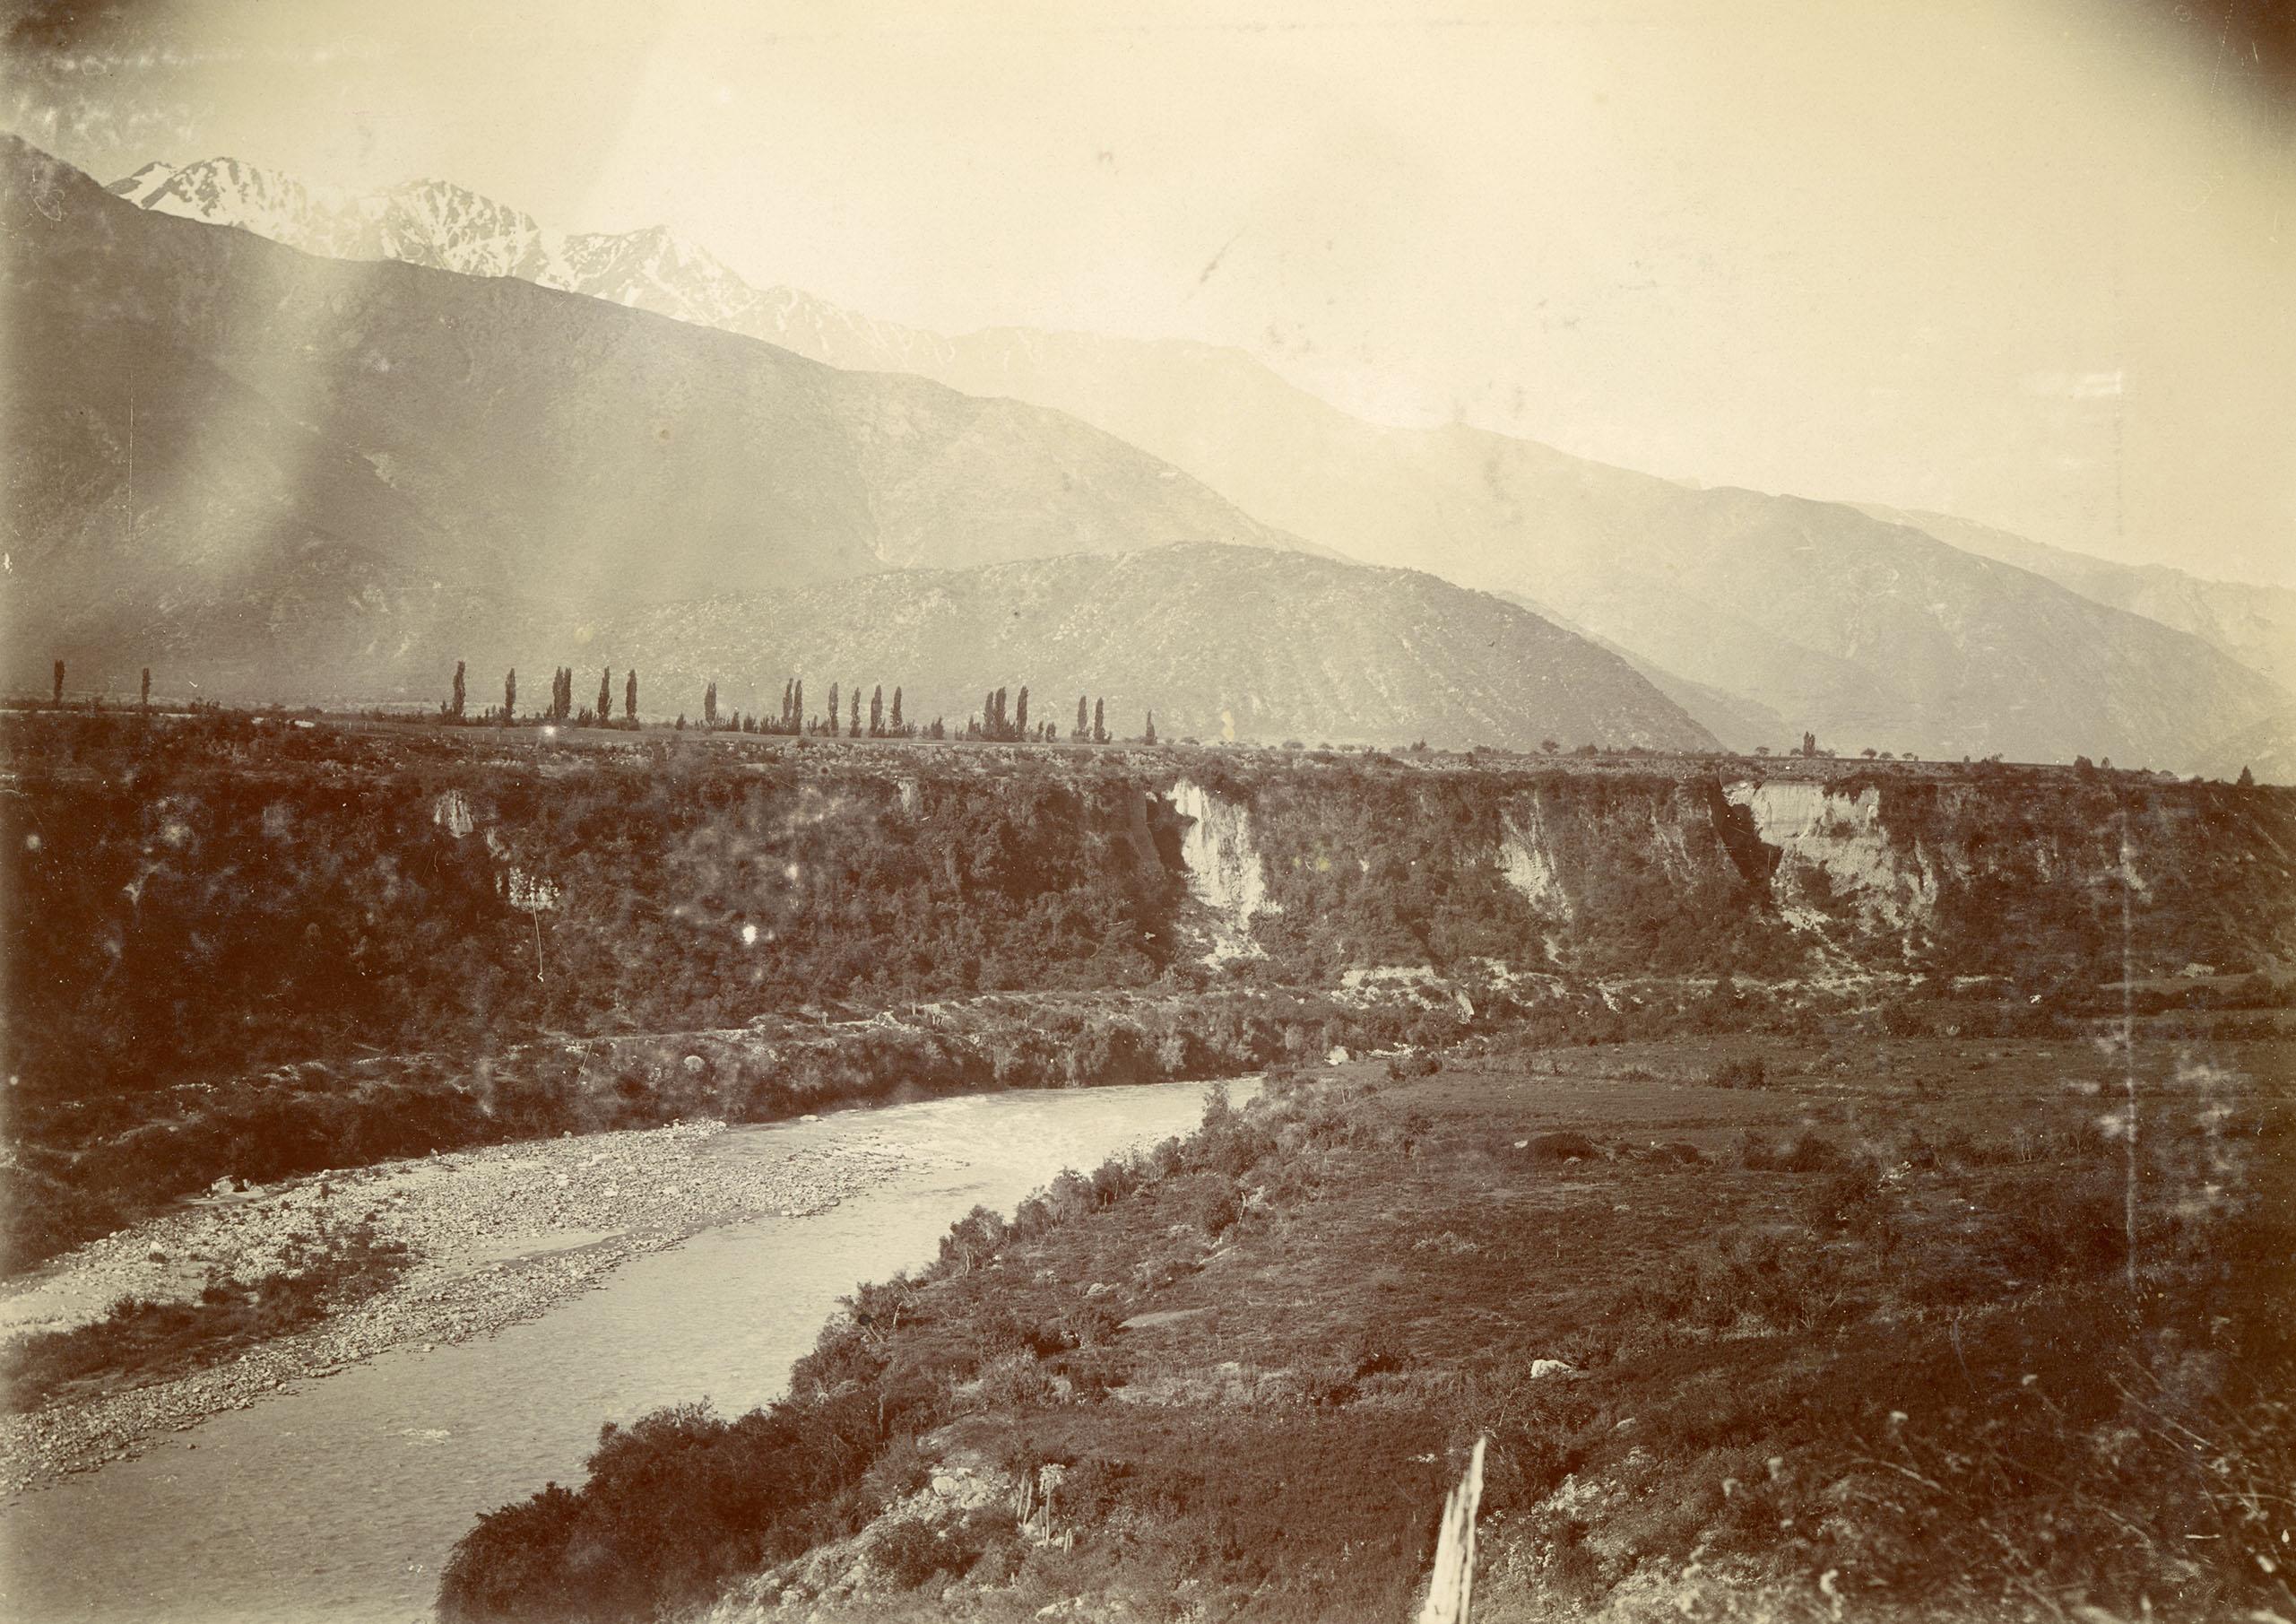 Enterreno - Fotos históricas de chile - fotos antiguas de Chile - Sectores de Pirque, CA 1904